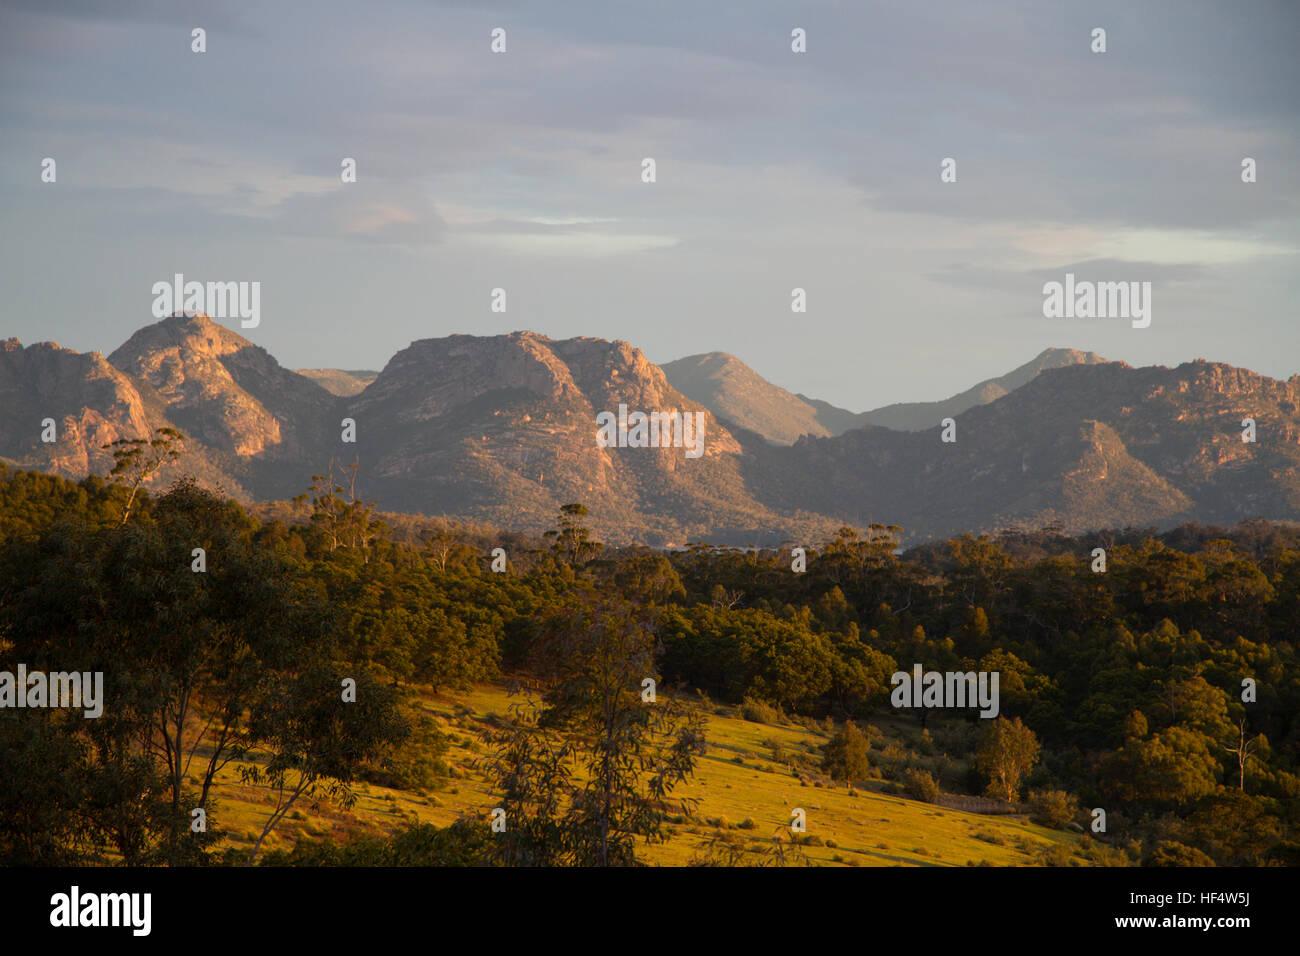 View of the Hazards mountain range - Stock Image